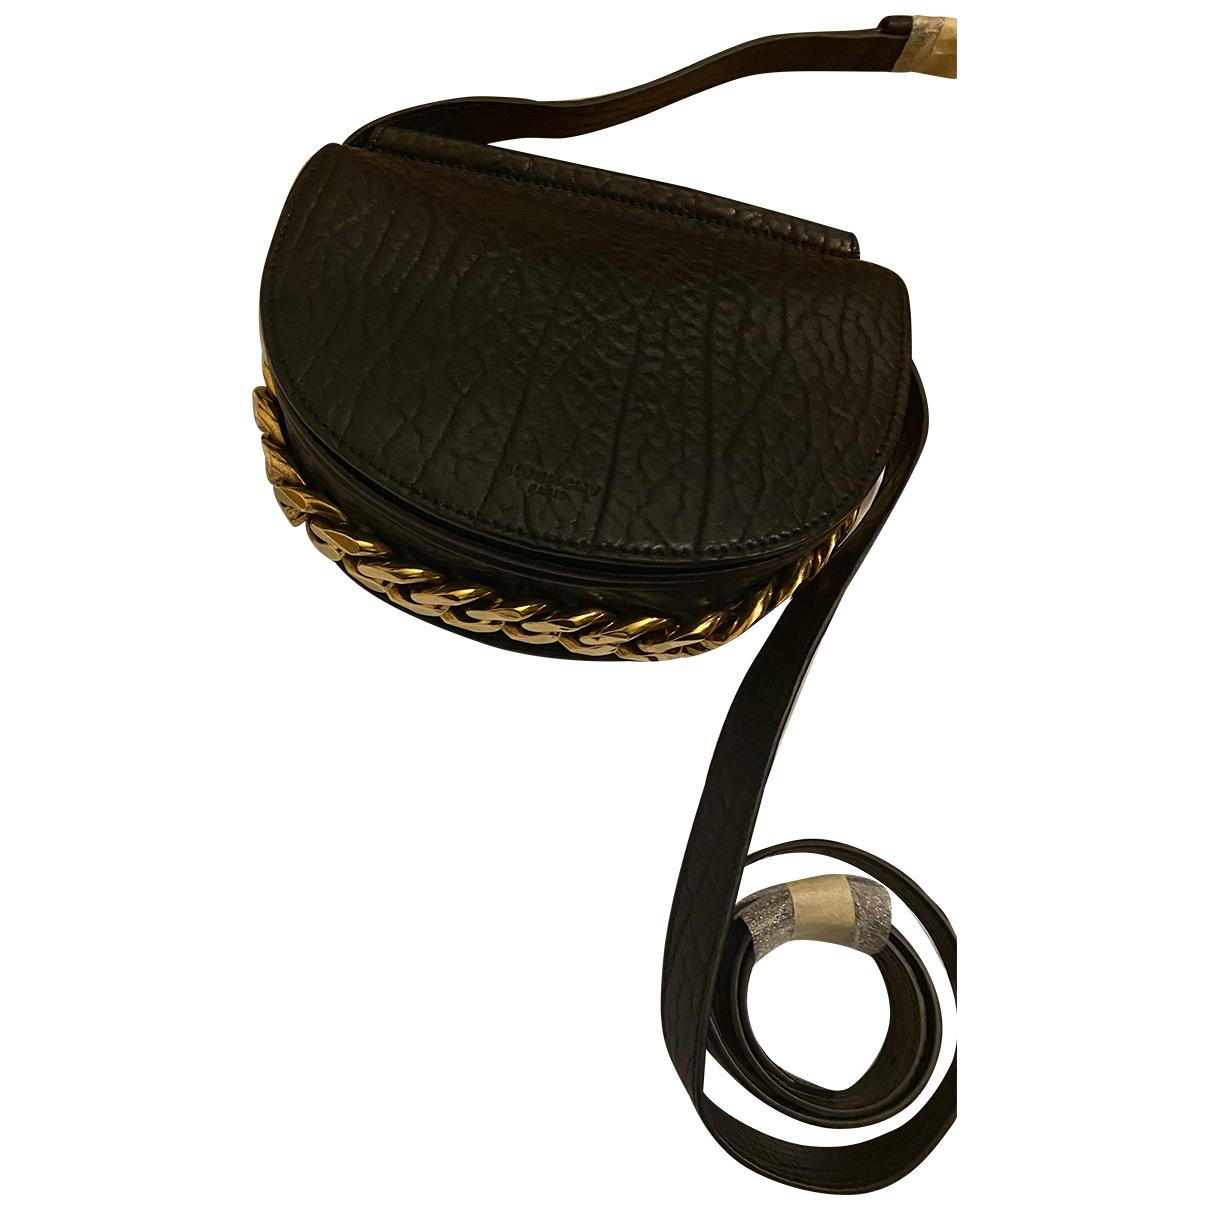 Givenchy Infinity Black Leather handbag for Women N